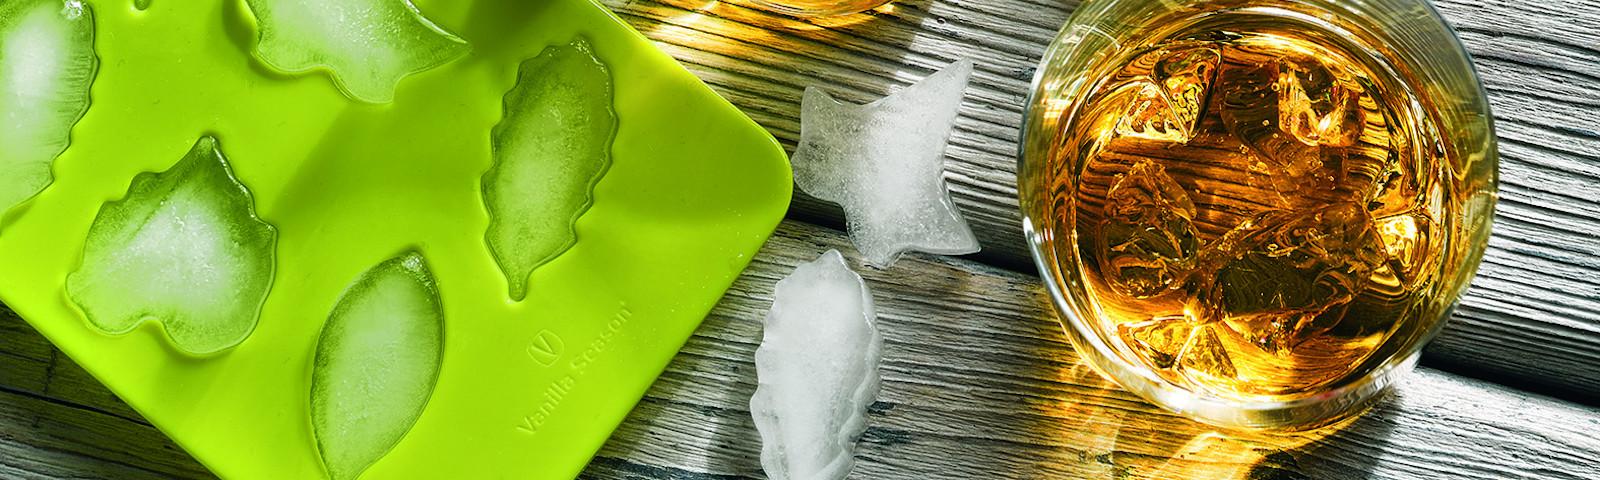 форма для льда фото